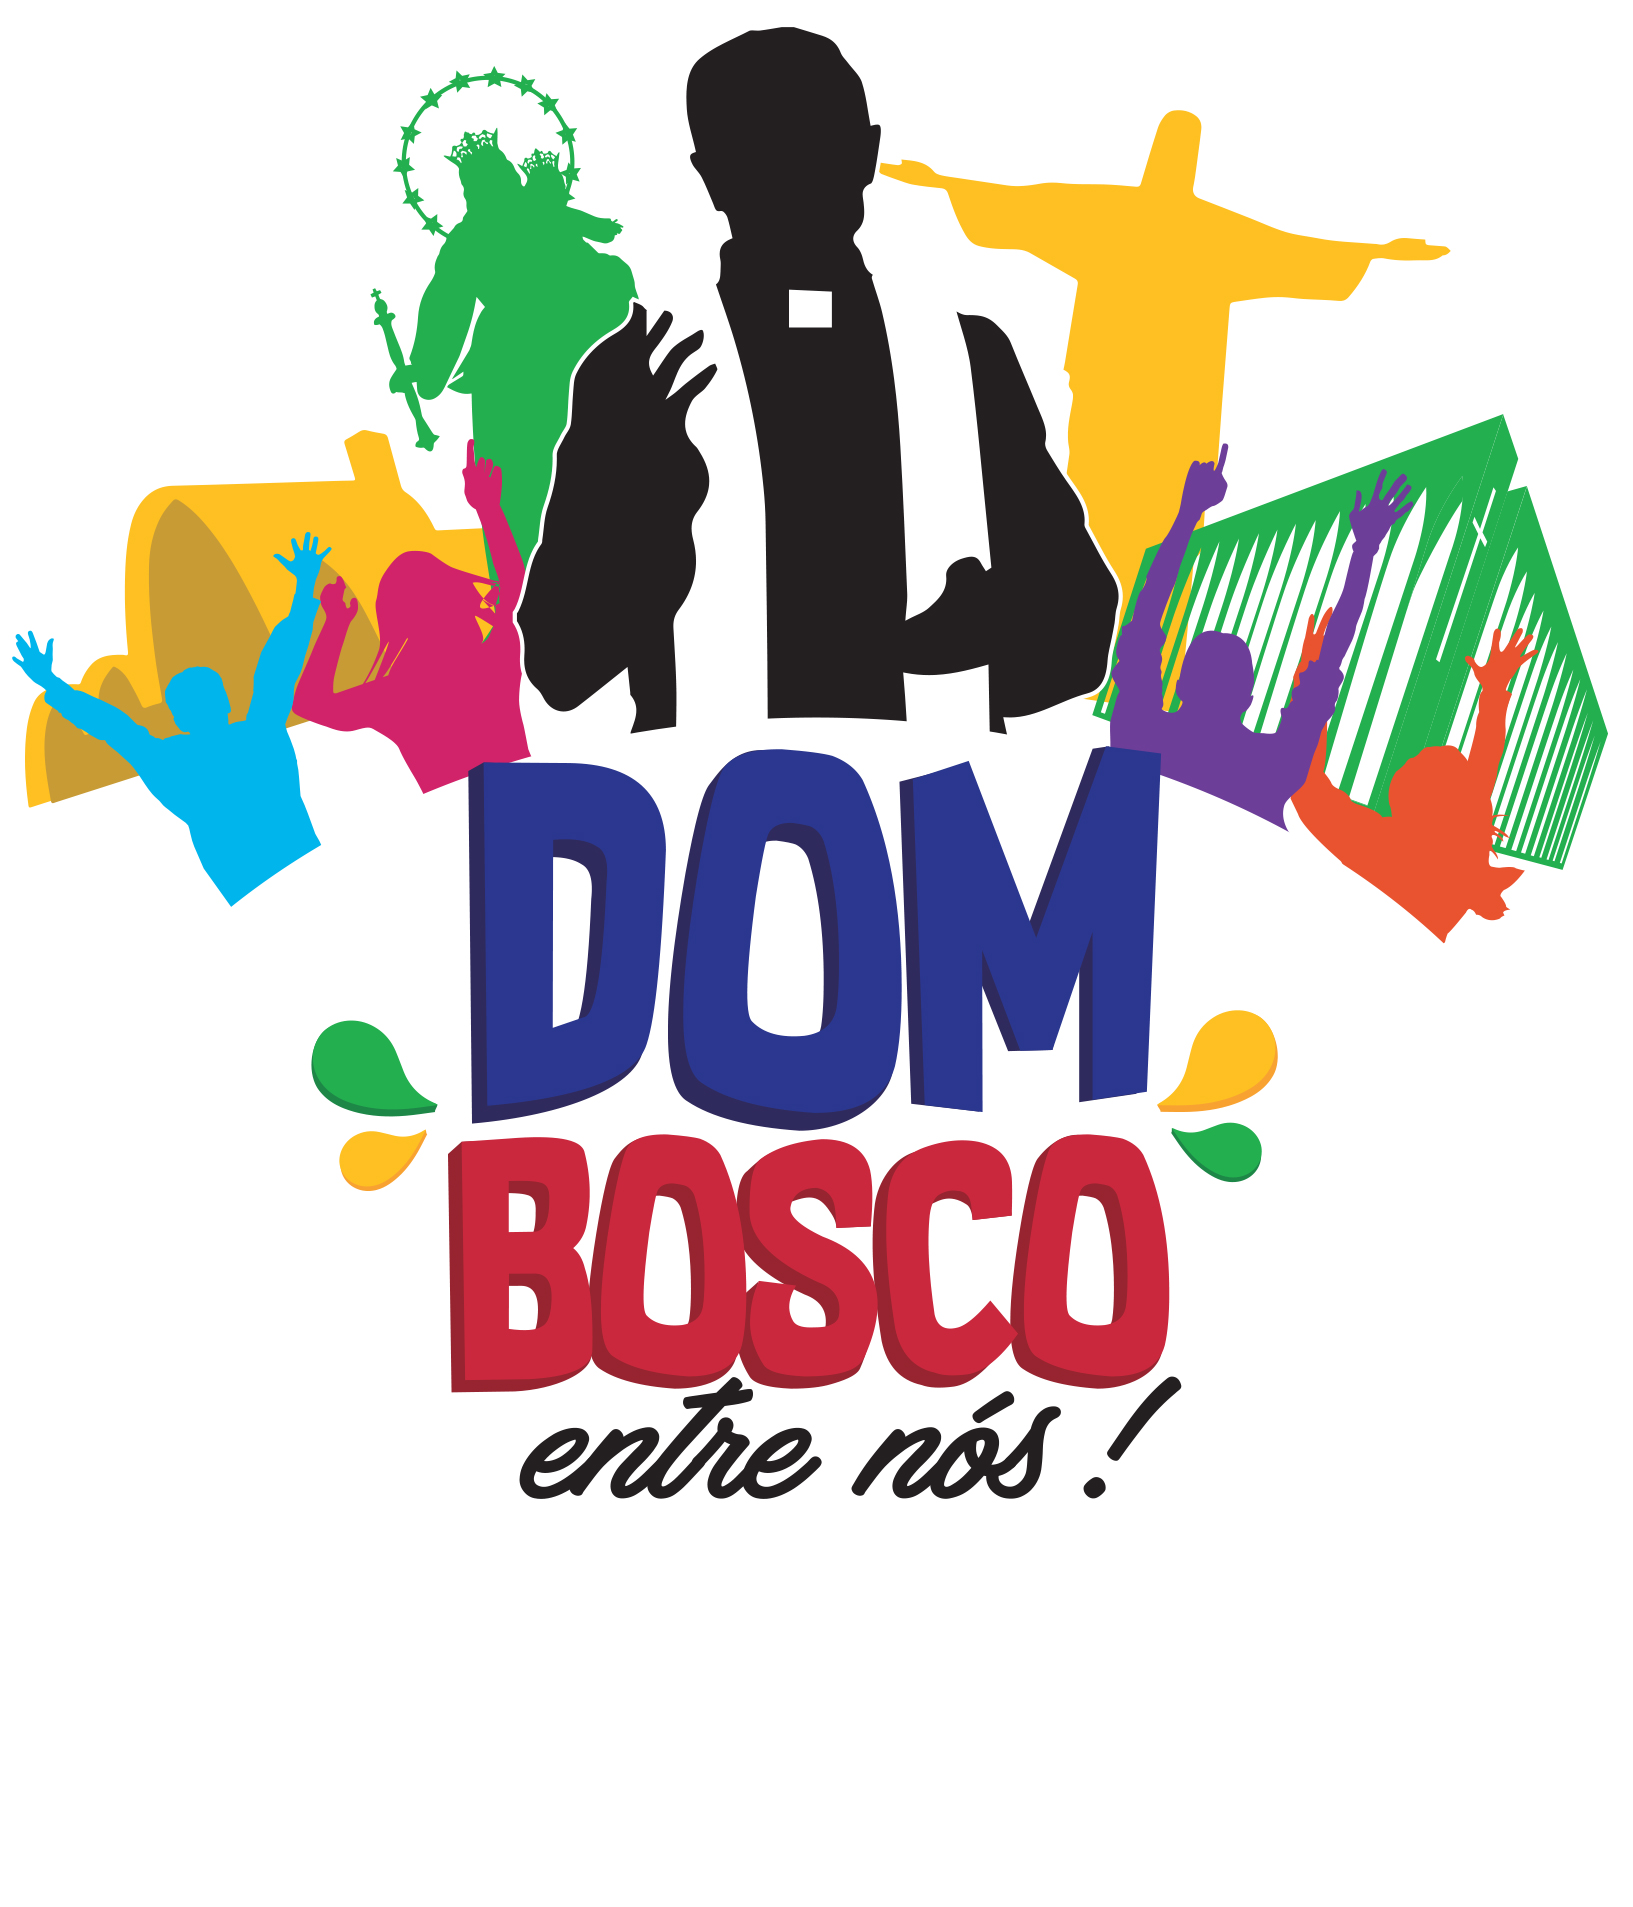 Dom_bosco_entre_n_s